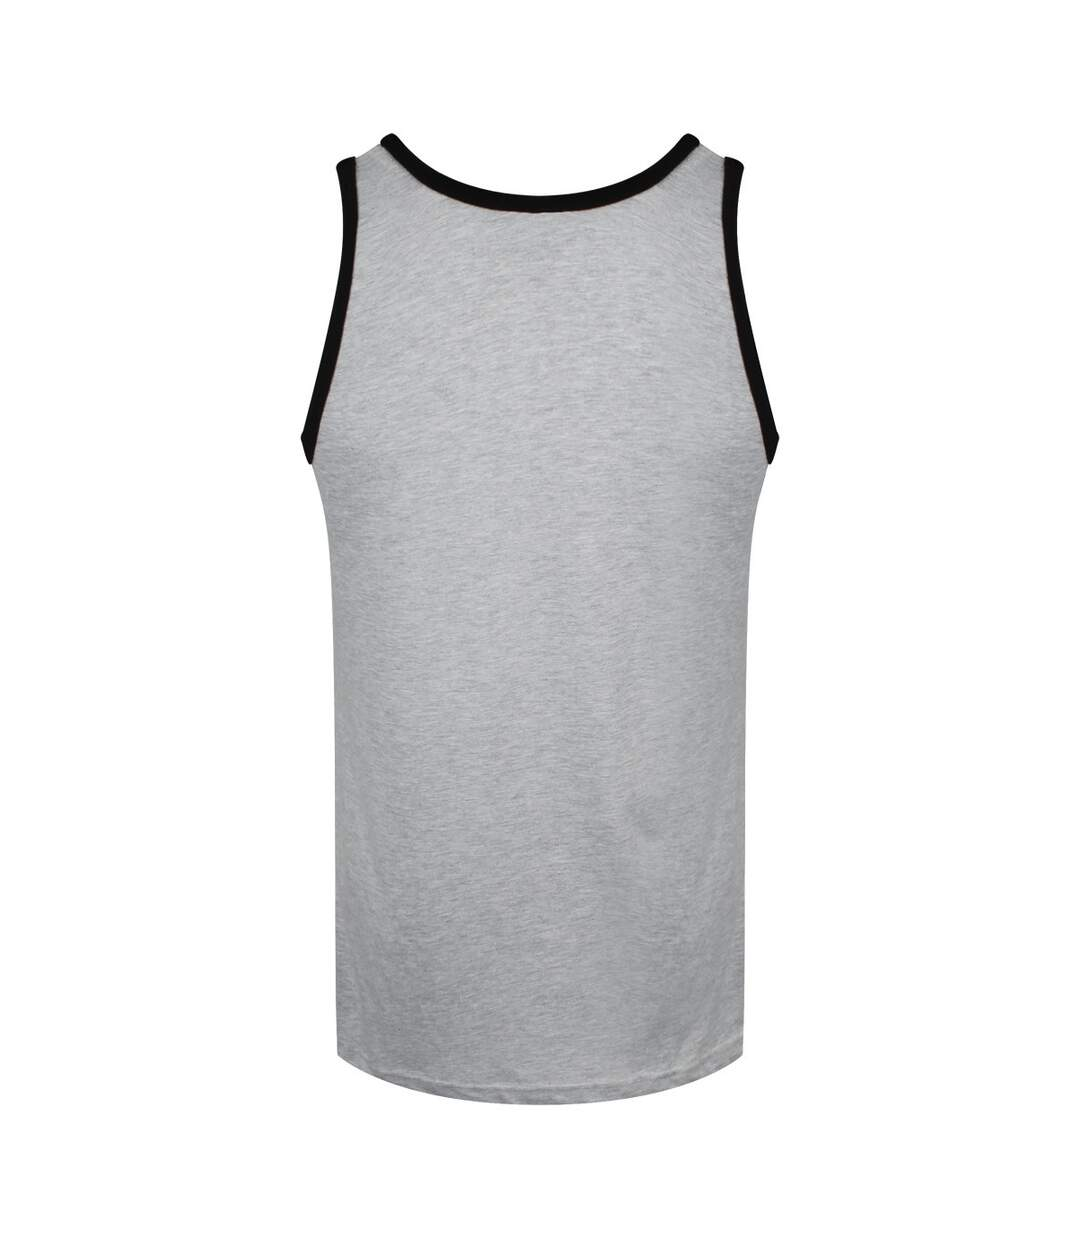 Grindstore Mens Unathletic Dept Tank Top (Grey/Black) - UTGR3522